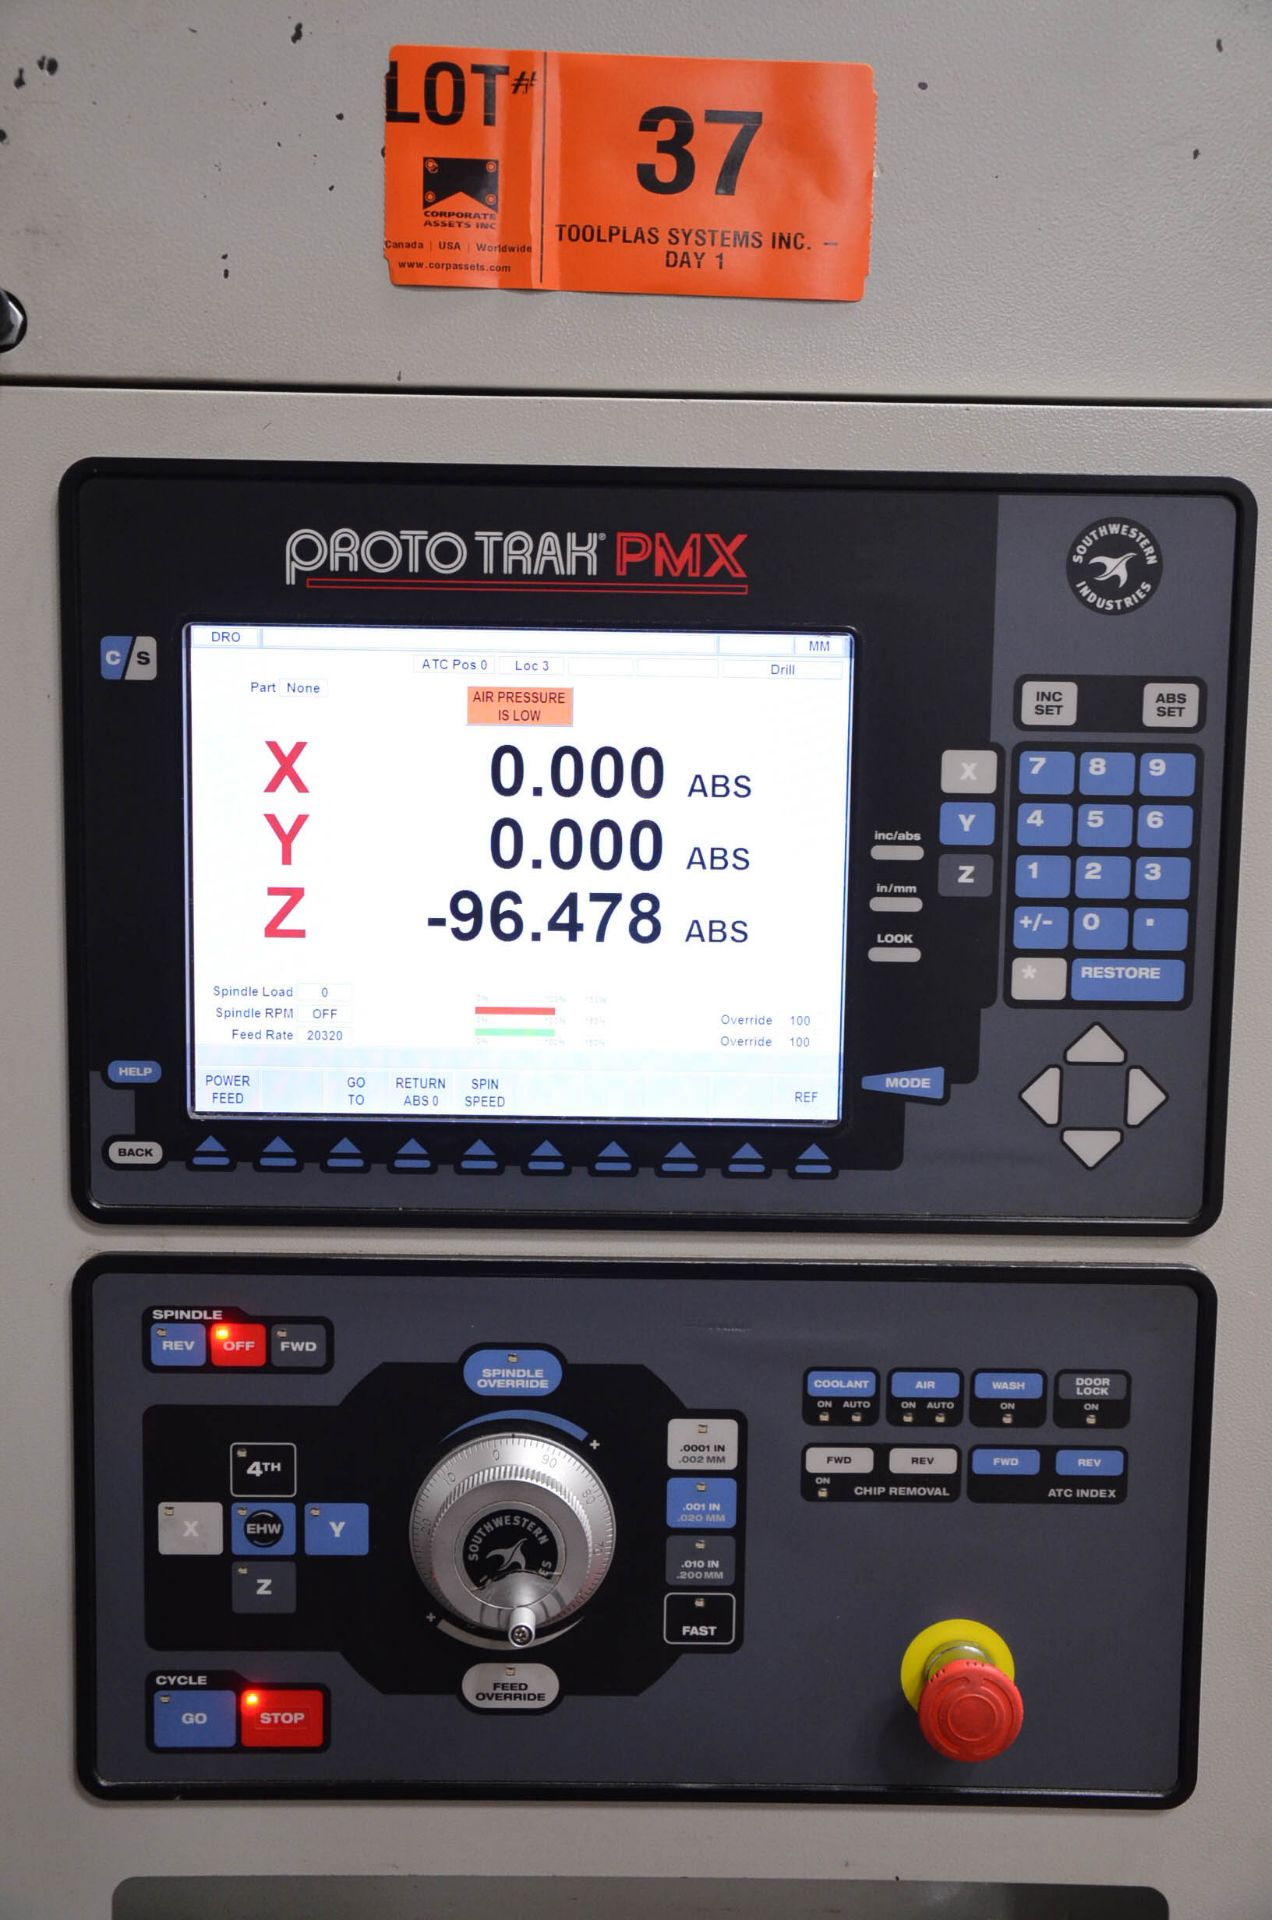 SWI (2012) TRAK LPM 4-AXIS READY CNC VERTICAL MACHINING CENTER WITH PROTO TRAK PMX CNC CONTROL, 19. - Image 10 of 10